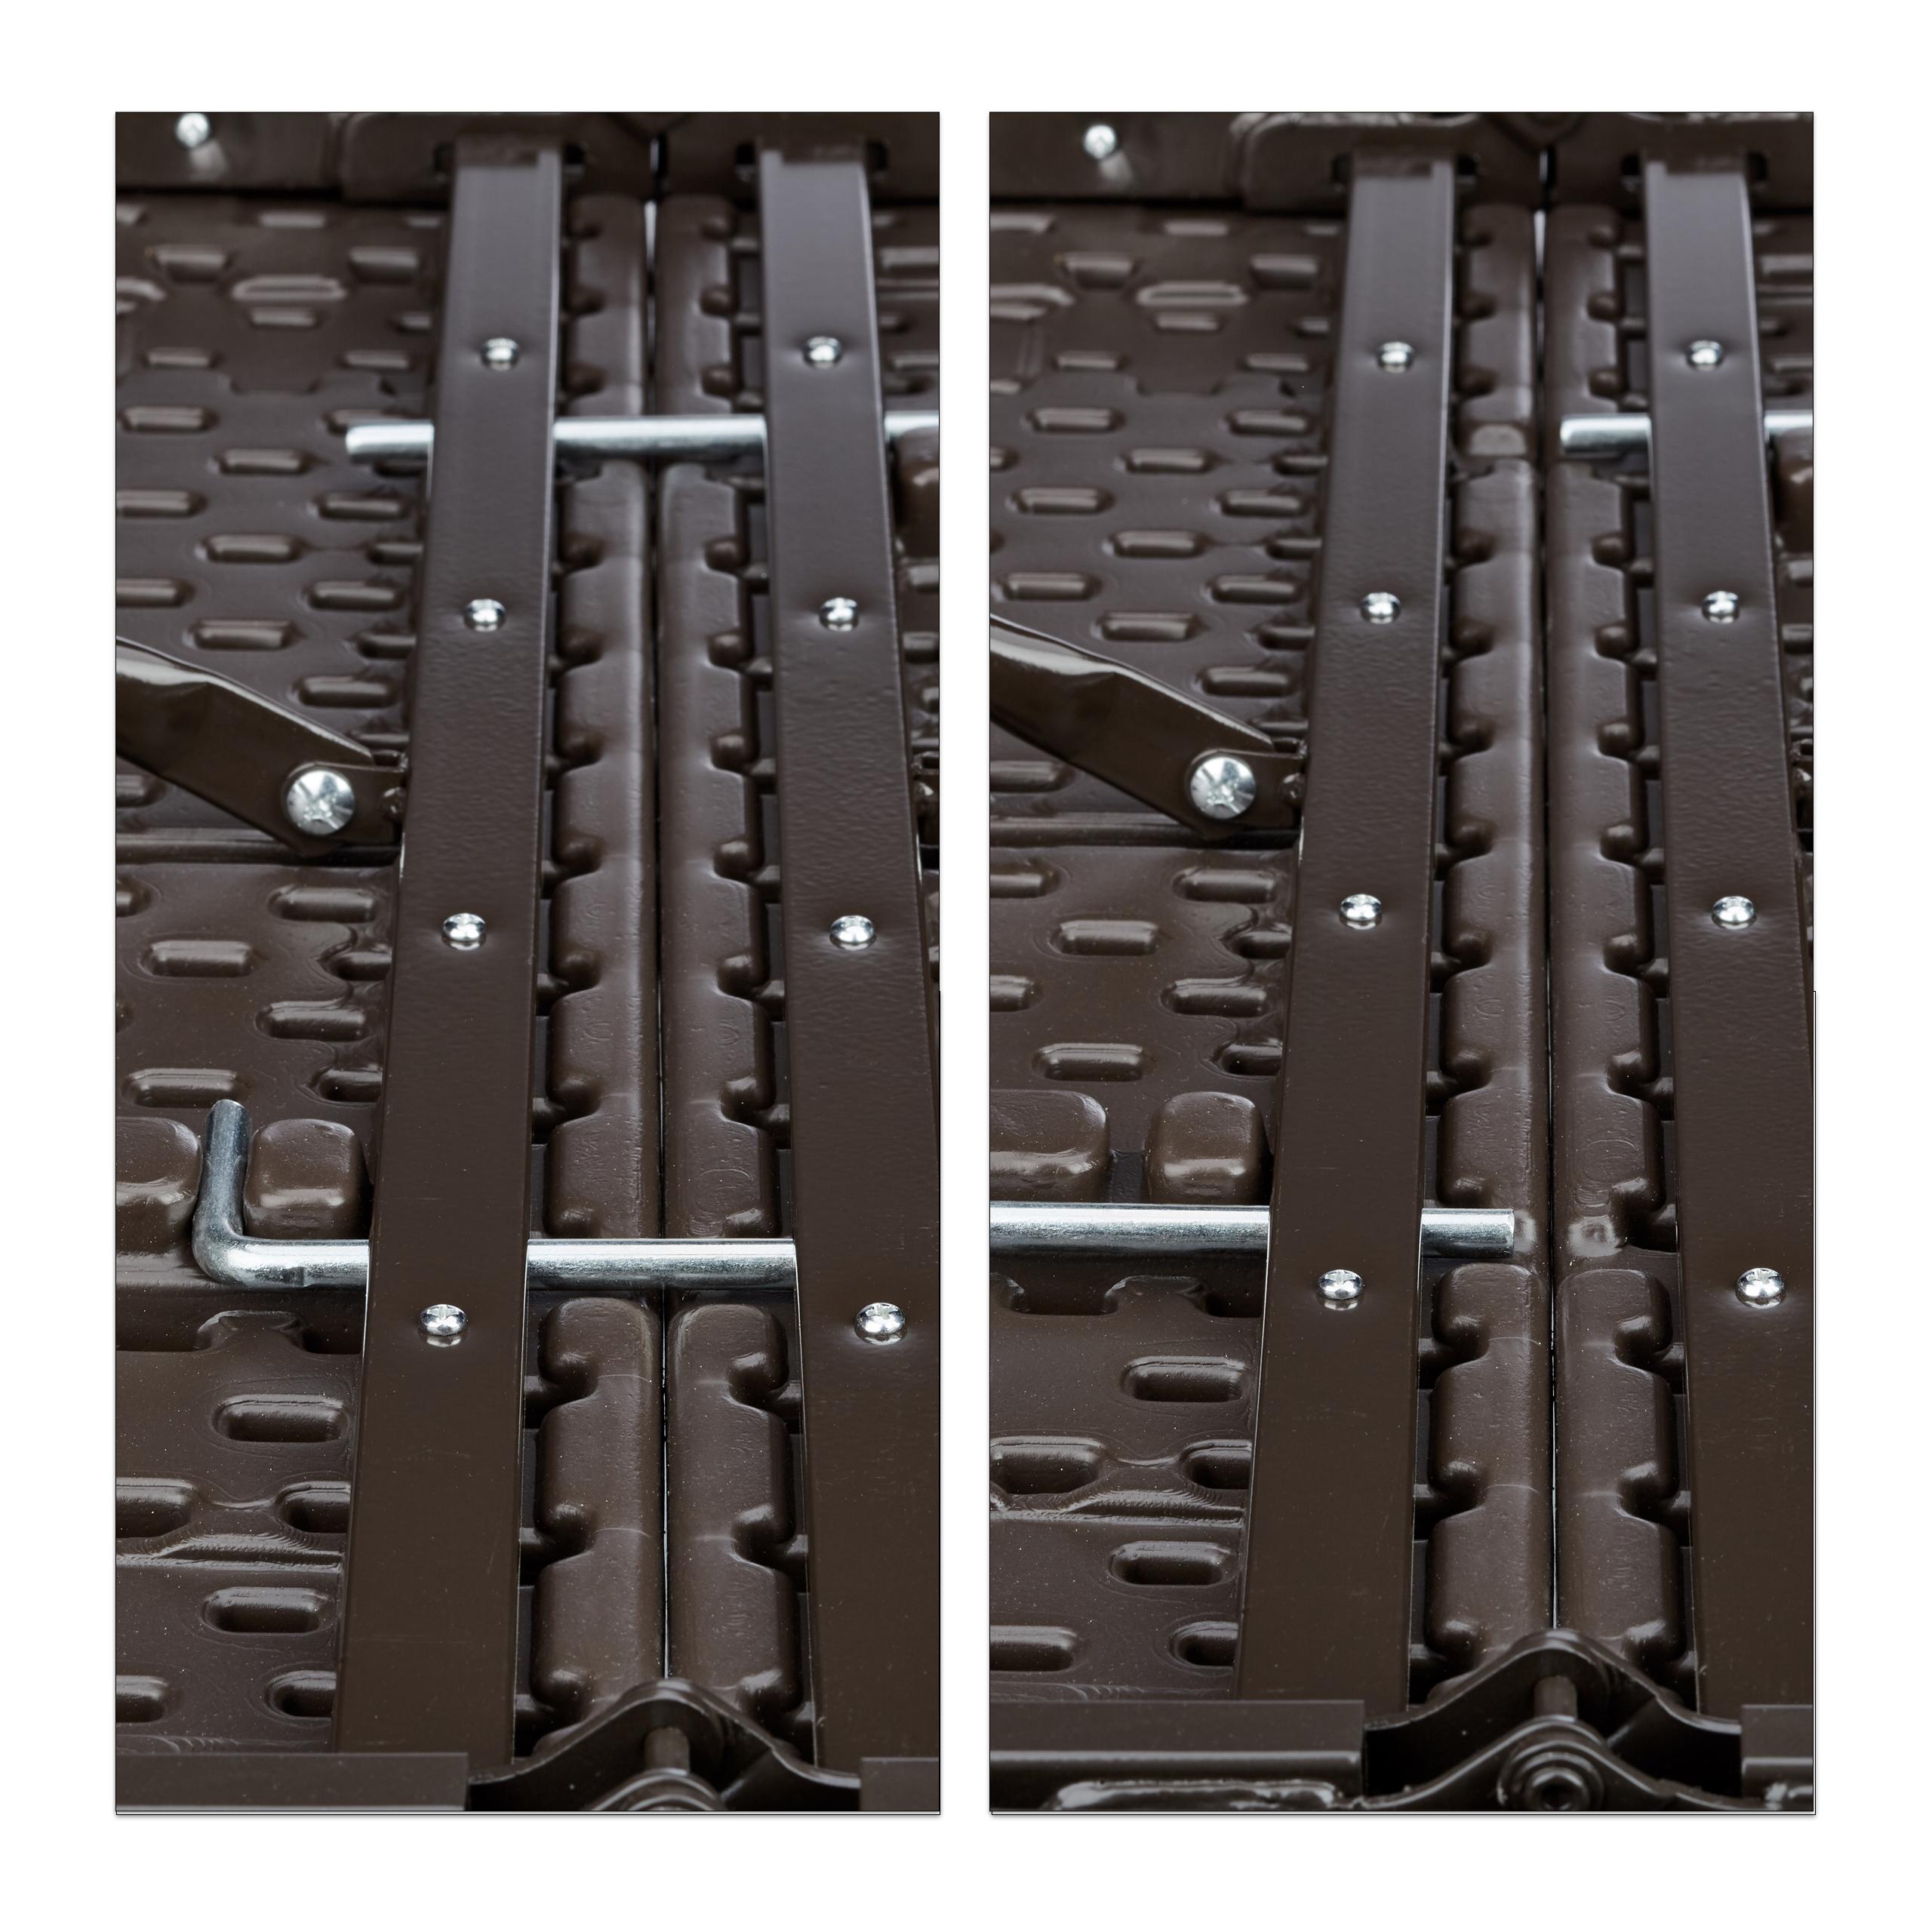 Bierzeltgarnitur-klappbar-BASTIAN-in-Rattan-Optik-Gartenmoebel-Set-Biertisch Indexbild 7